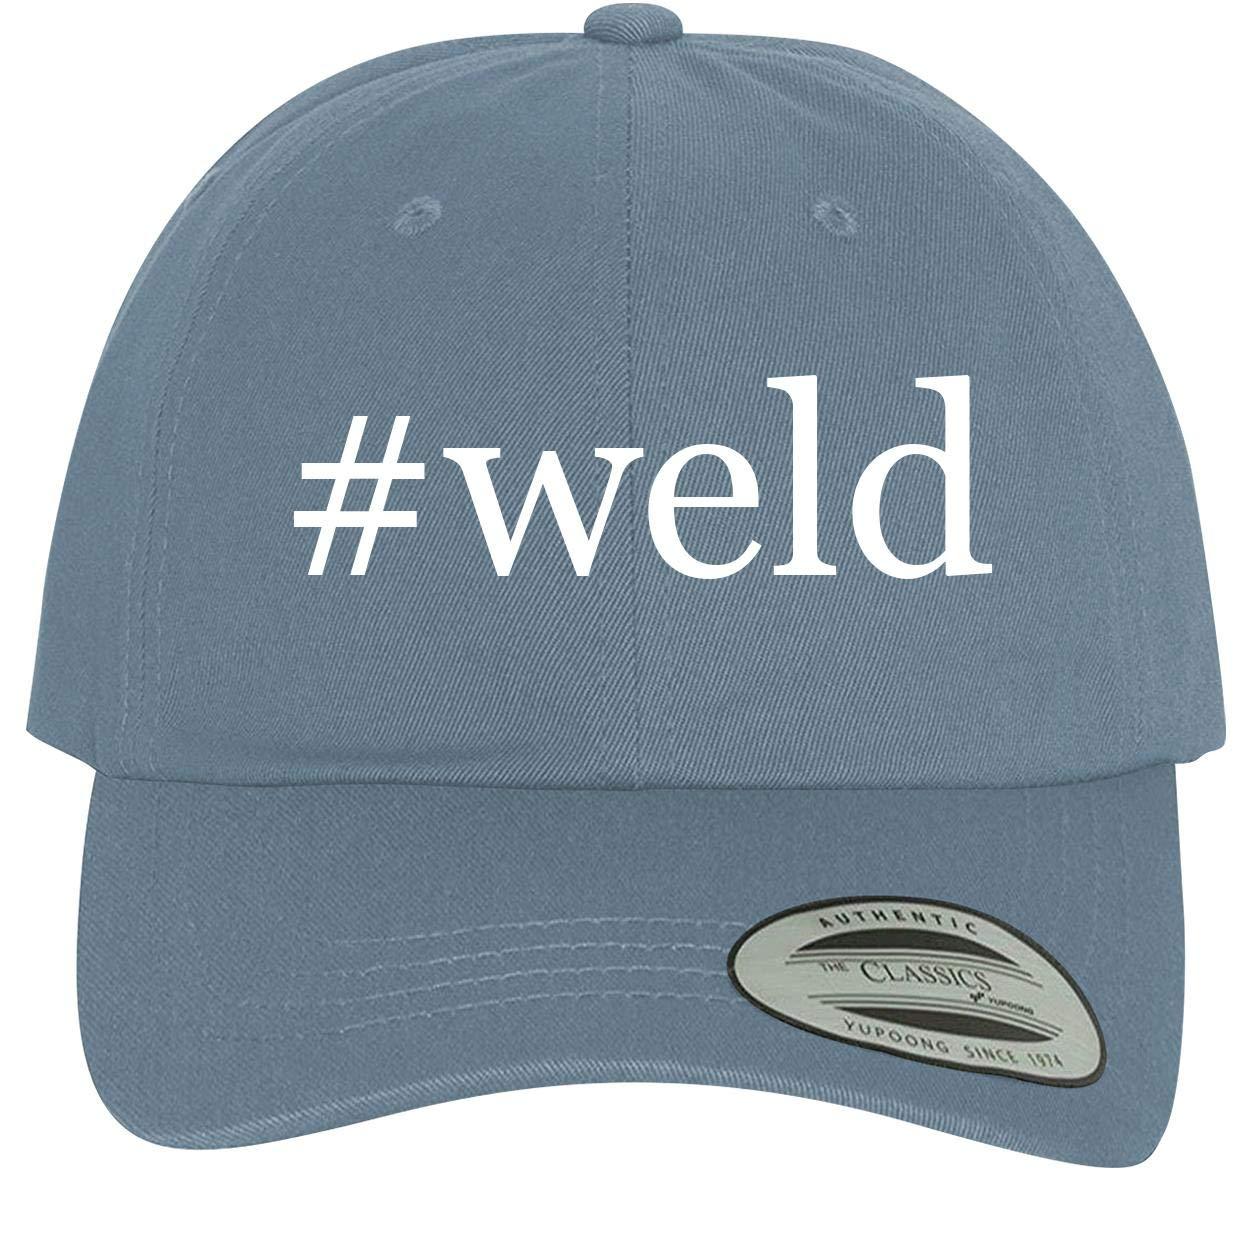 Comfortable Dad Hat Baseball Cap BH Cool Designs #Weld